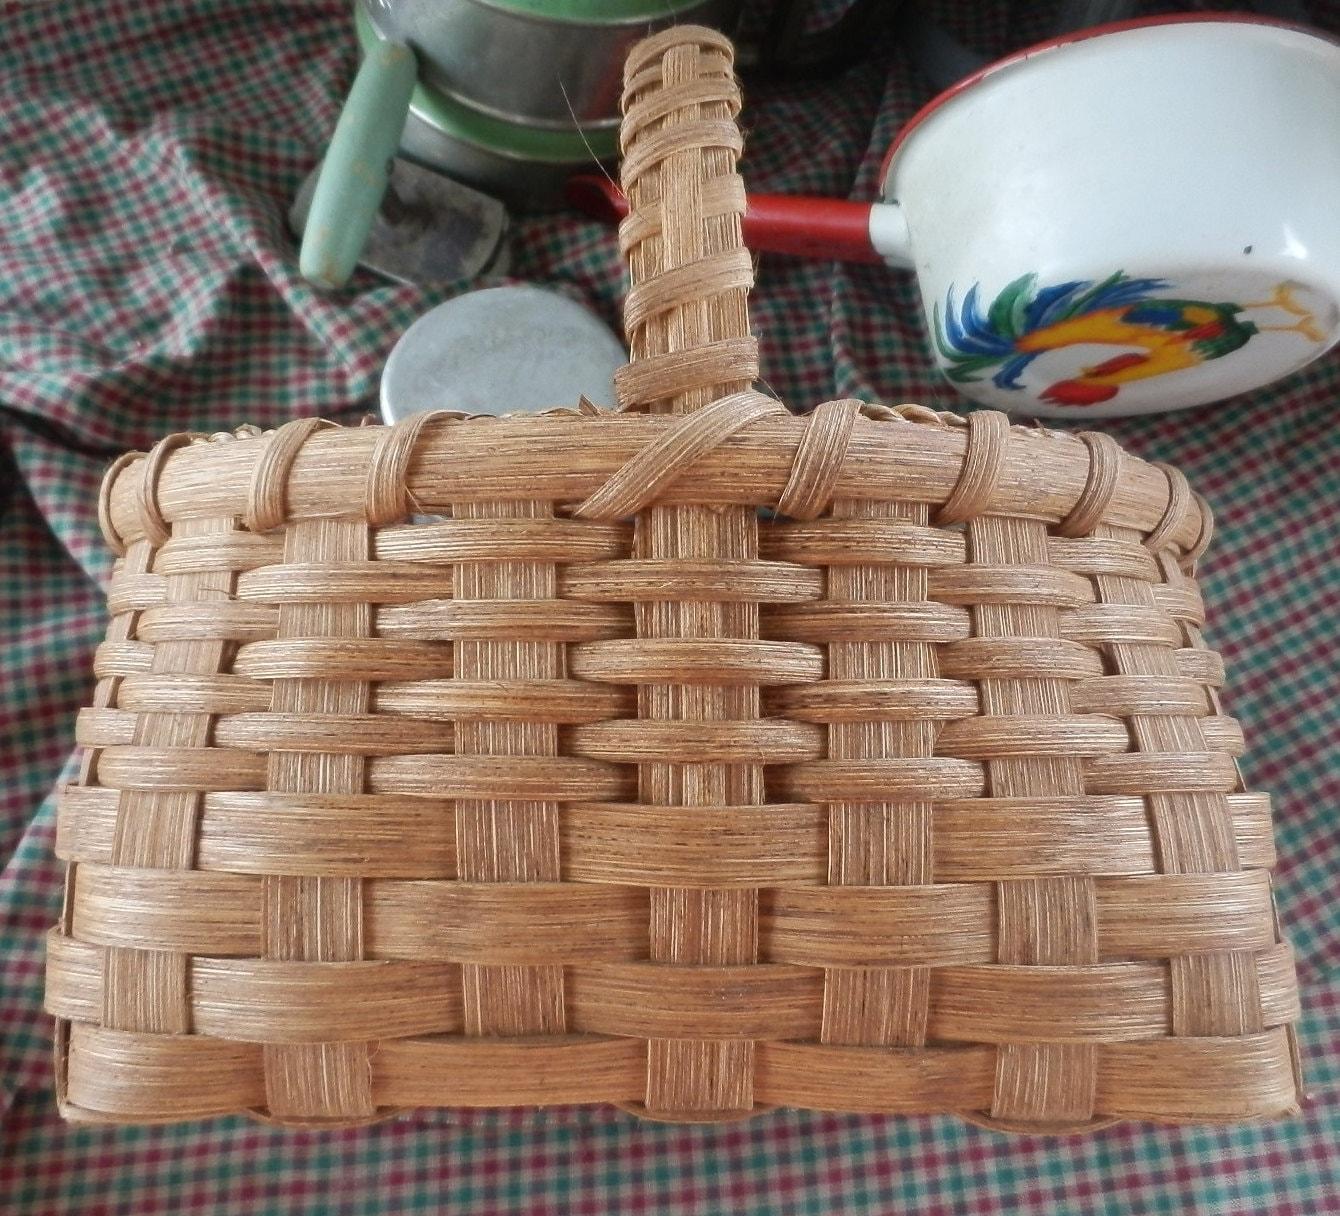 Handmade Market Baskets : Small market basket country handmade woven